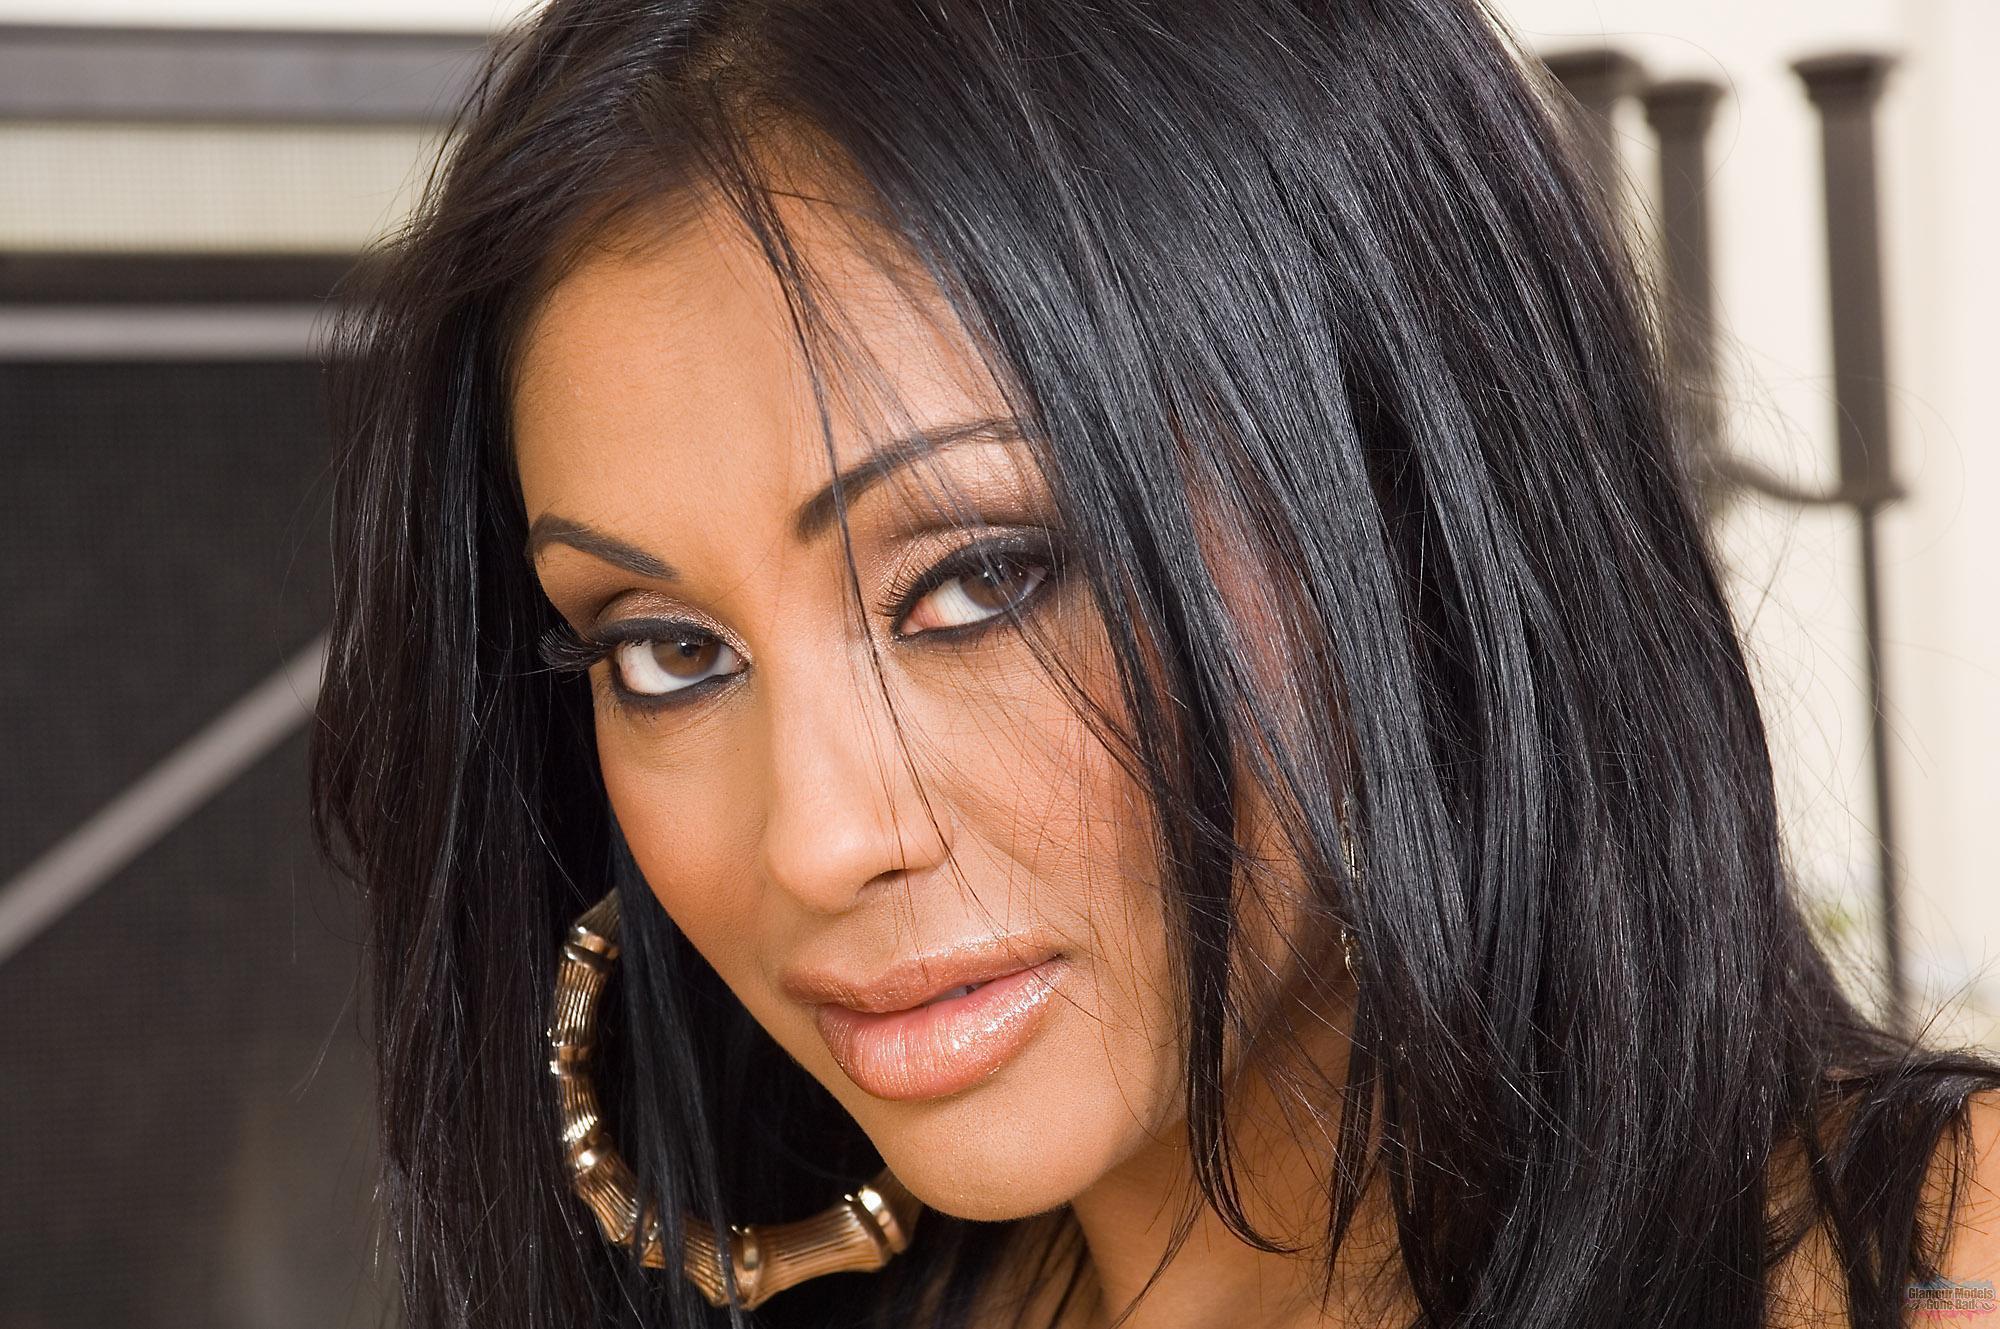 Priya Rai Fuck 86